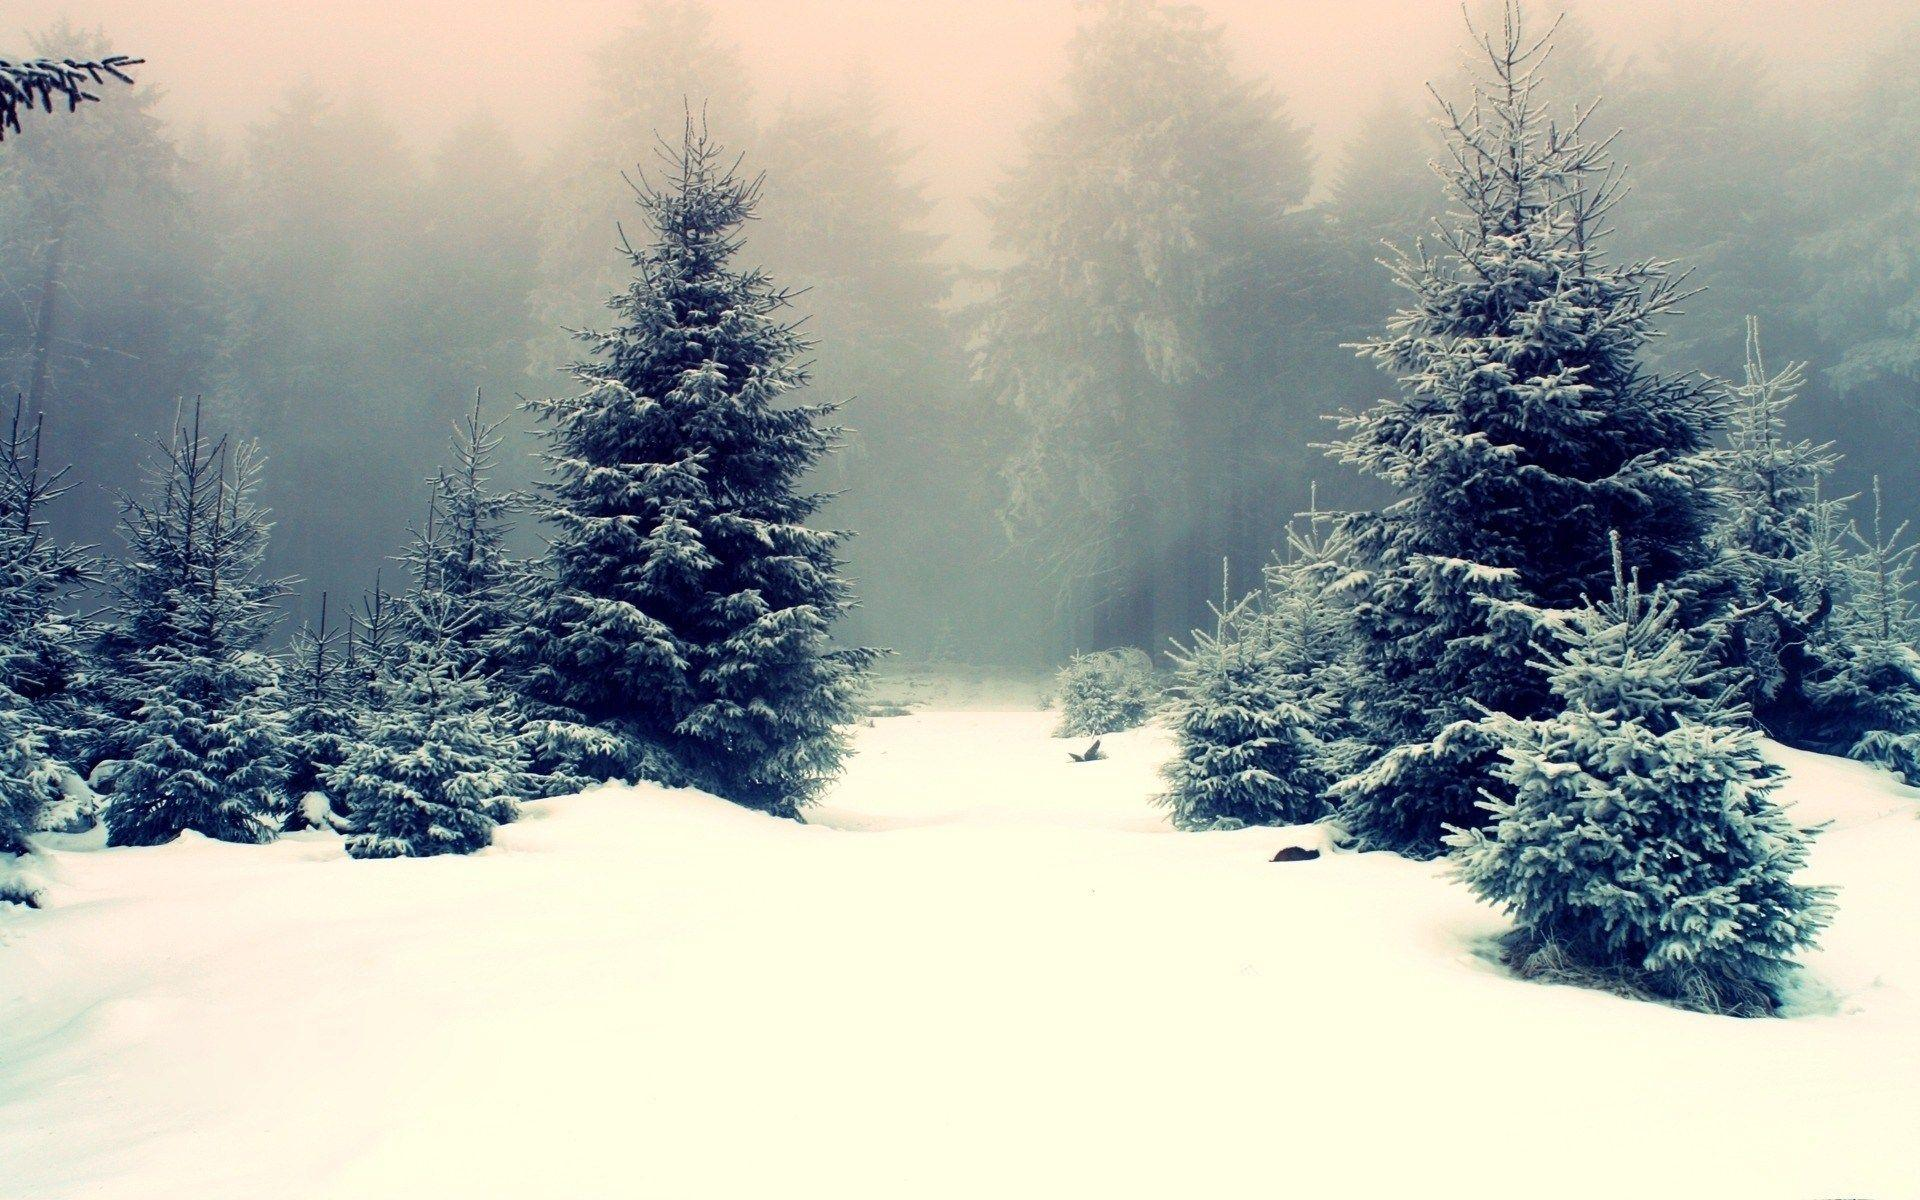 Winter Trees Wallpapers Wallpaper